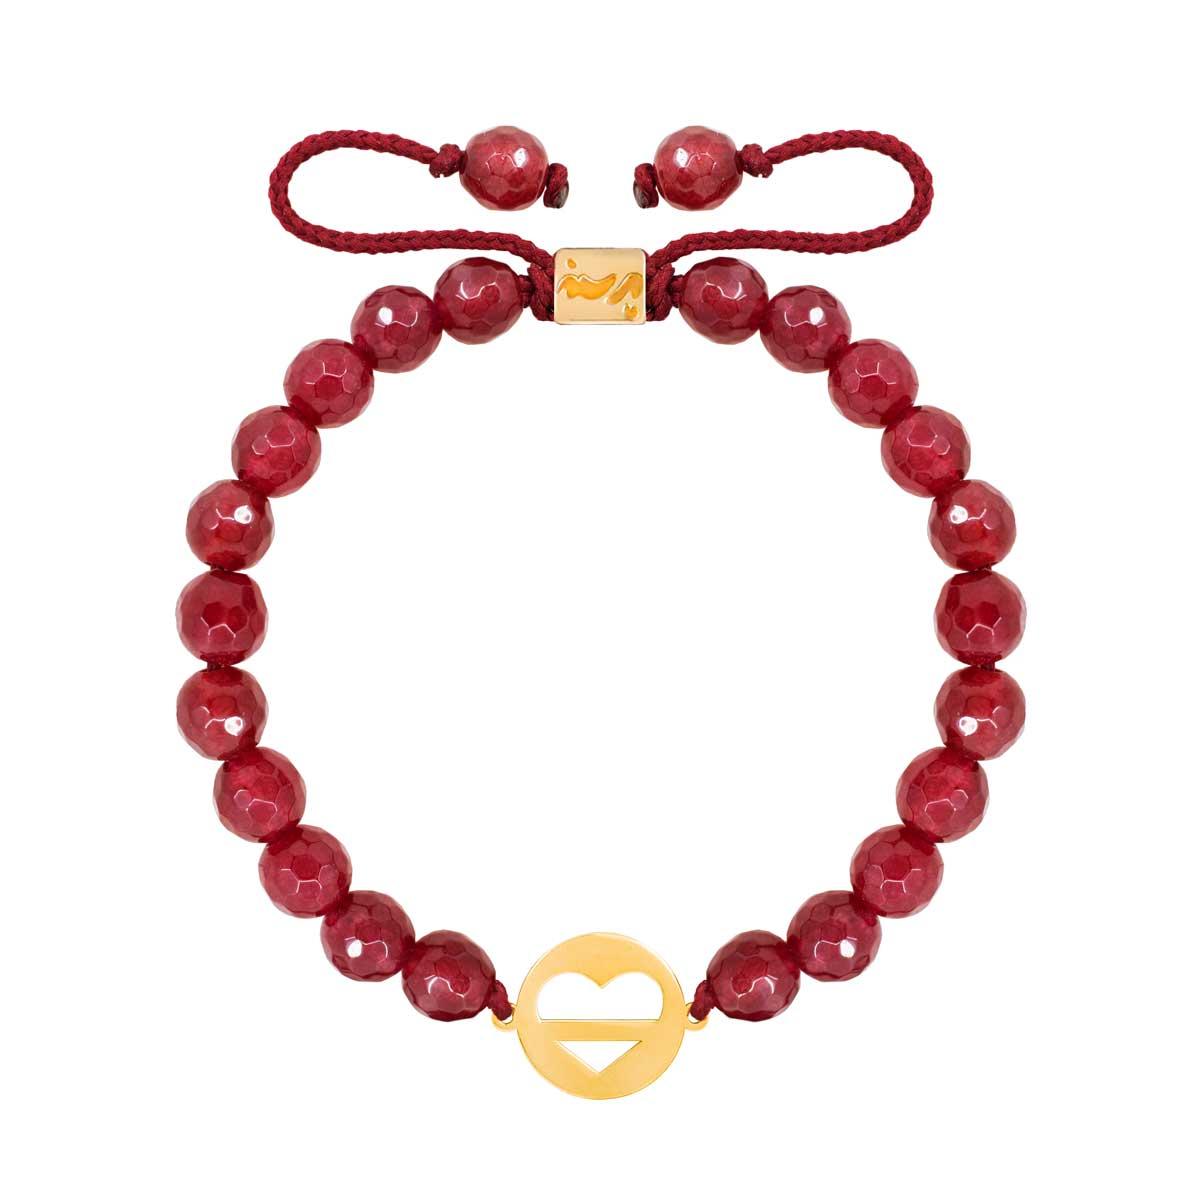 دستبند طلا قلب و خط